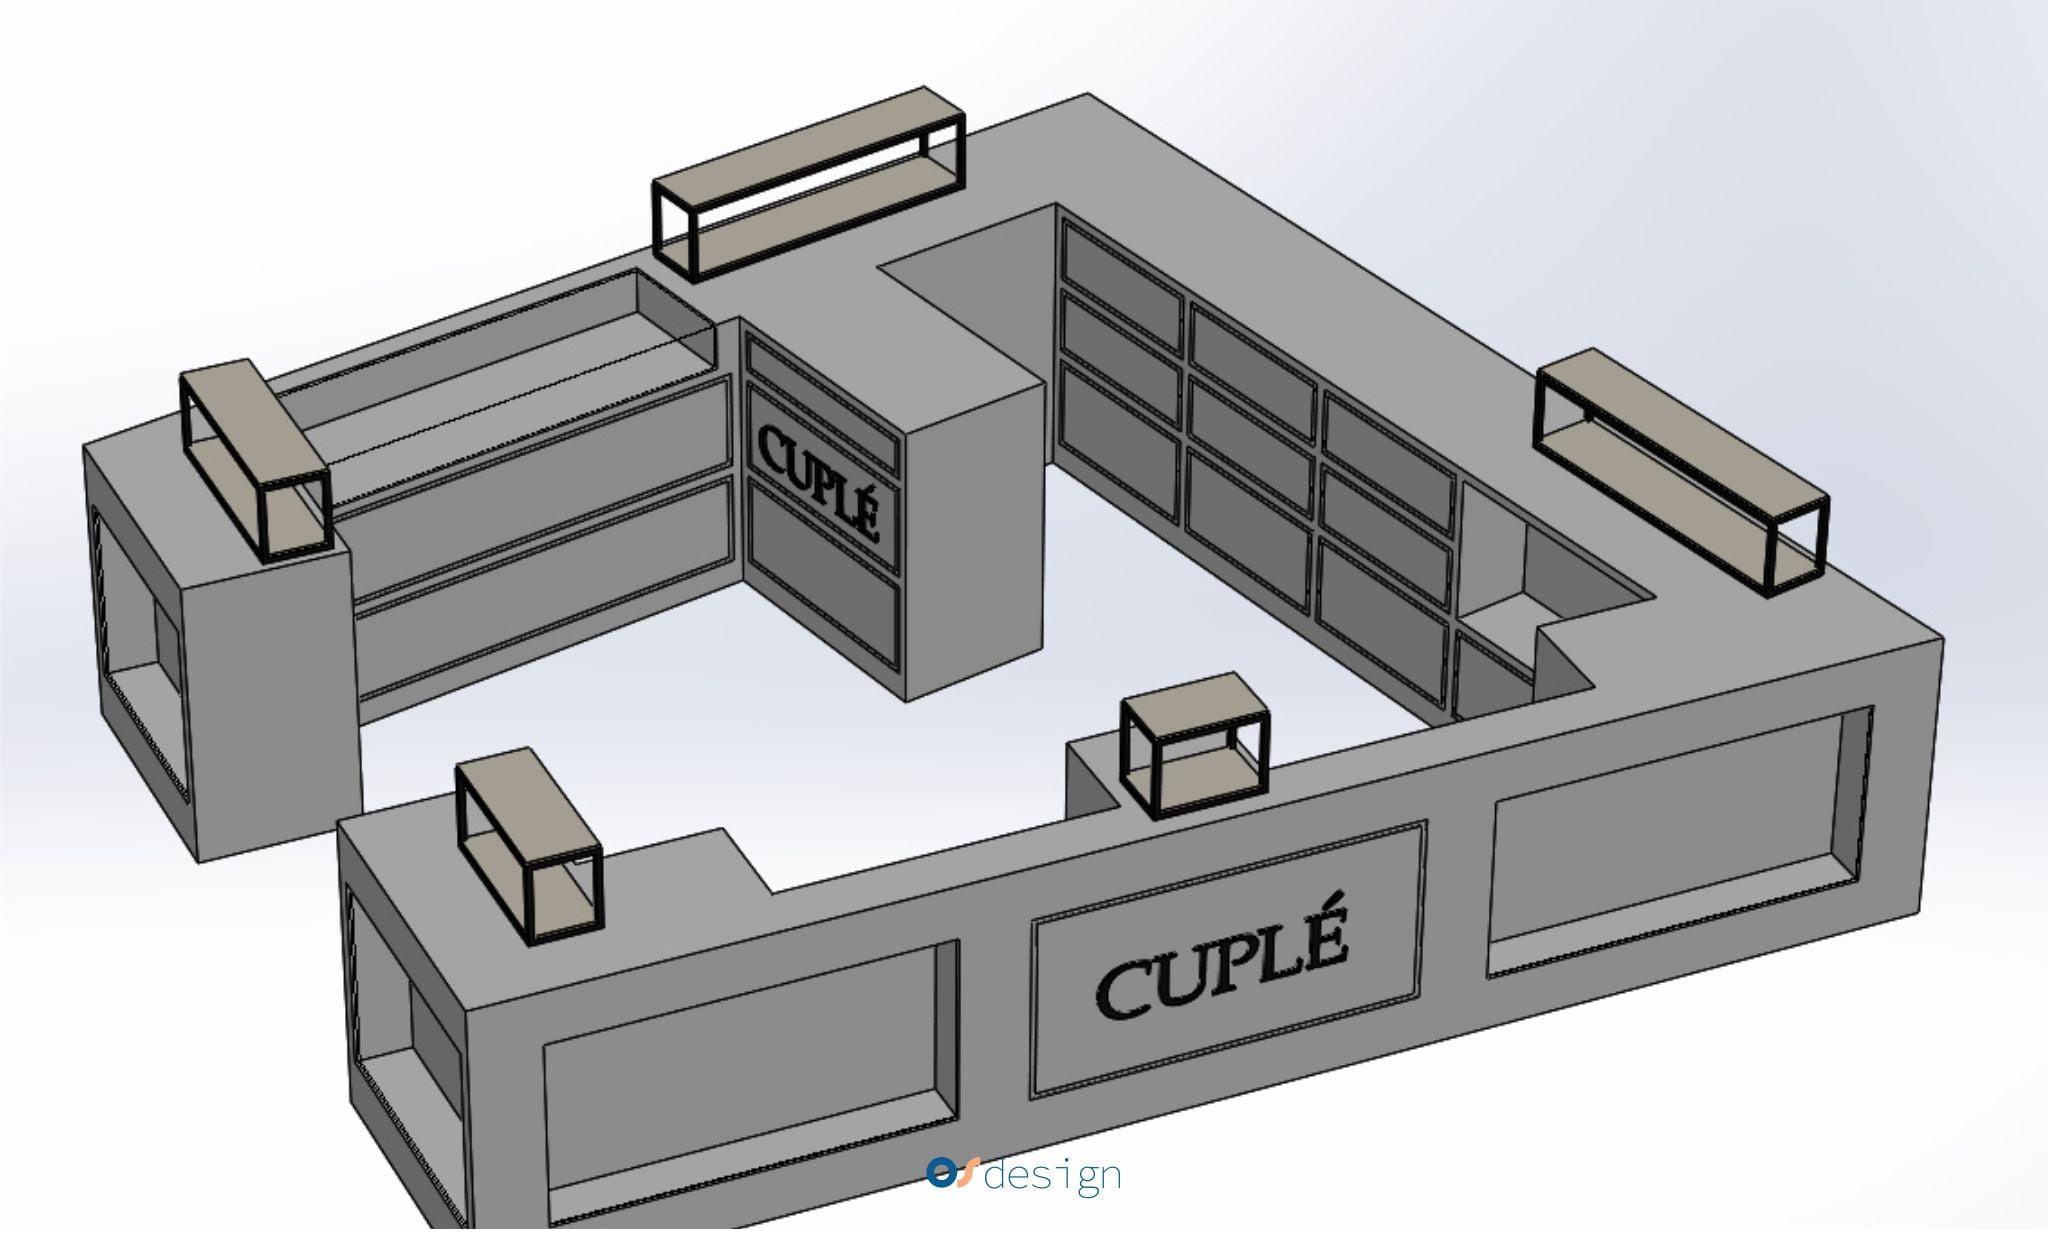 cuple_01c